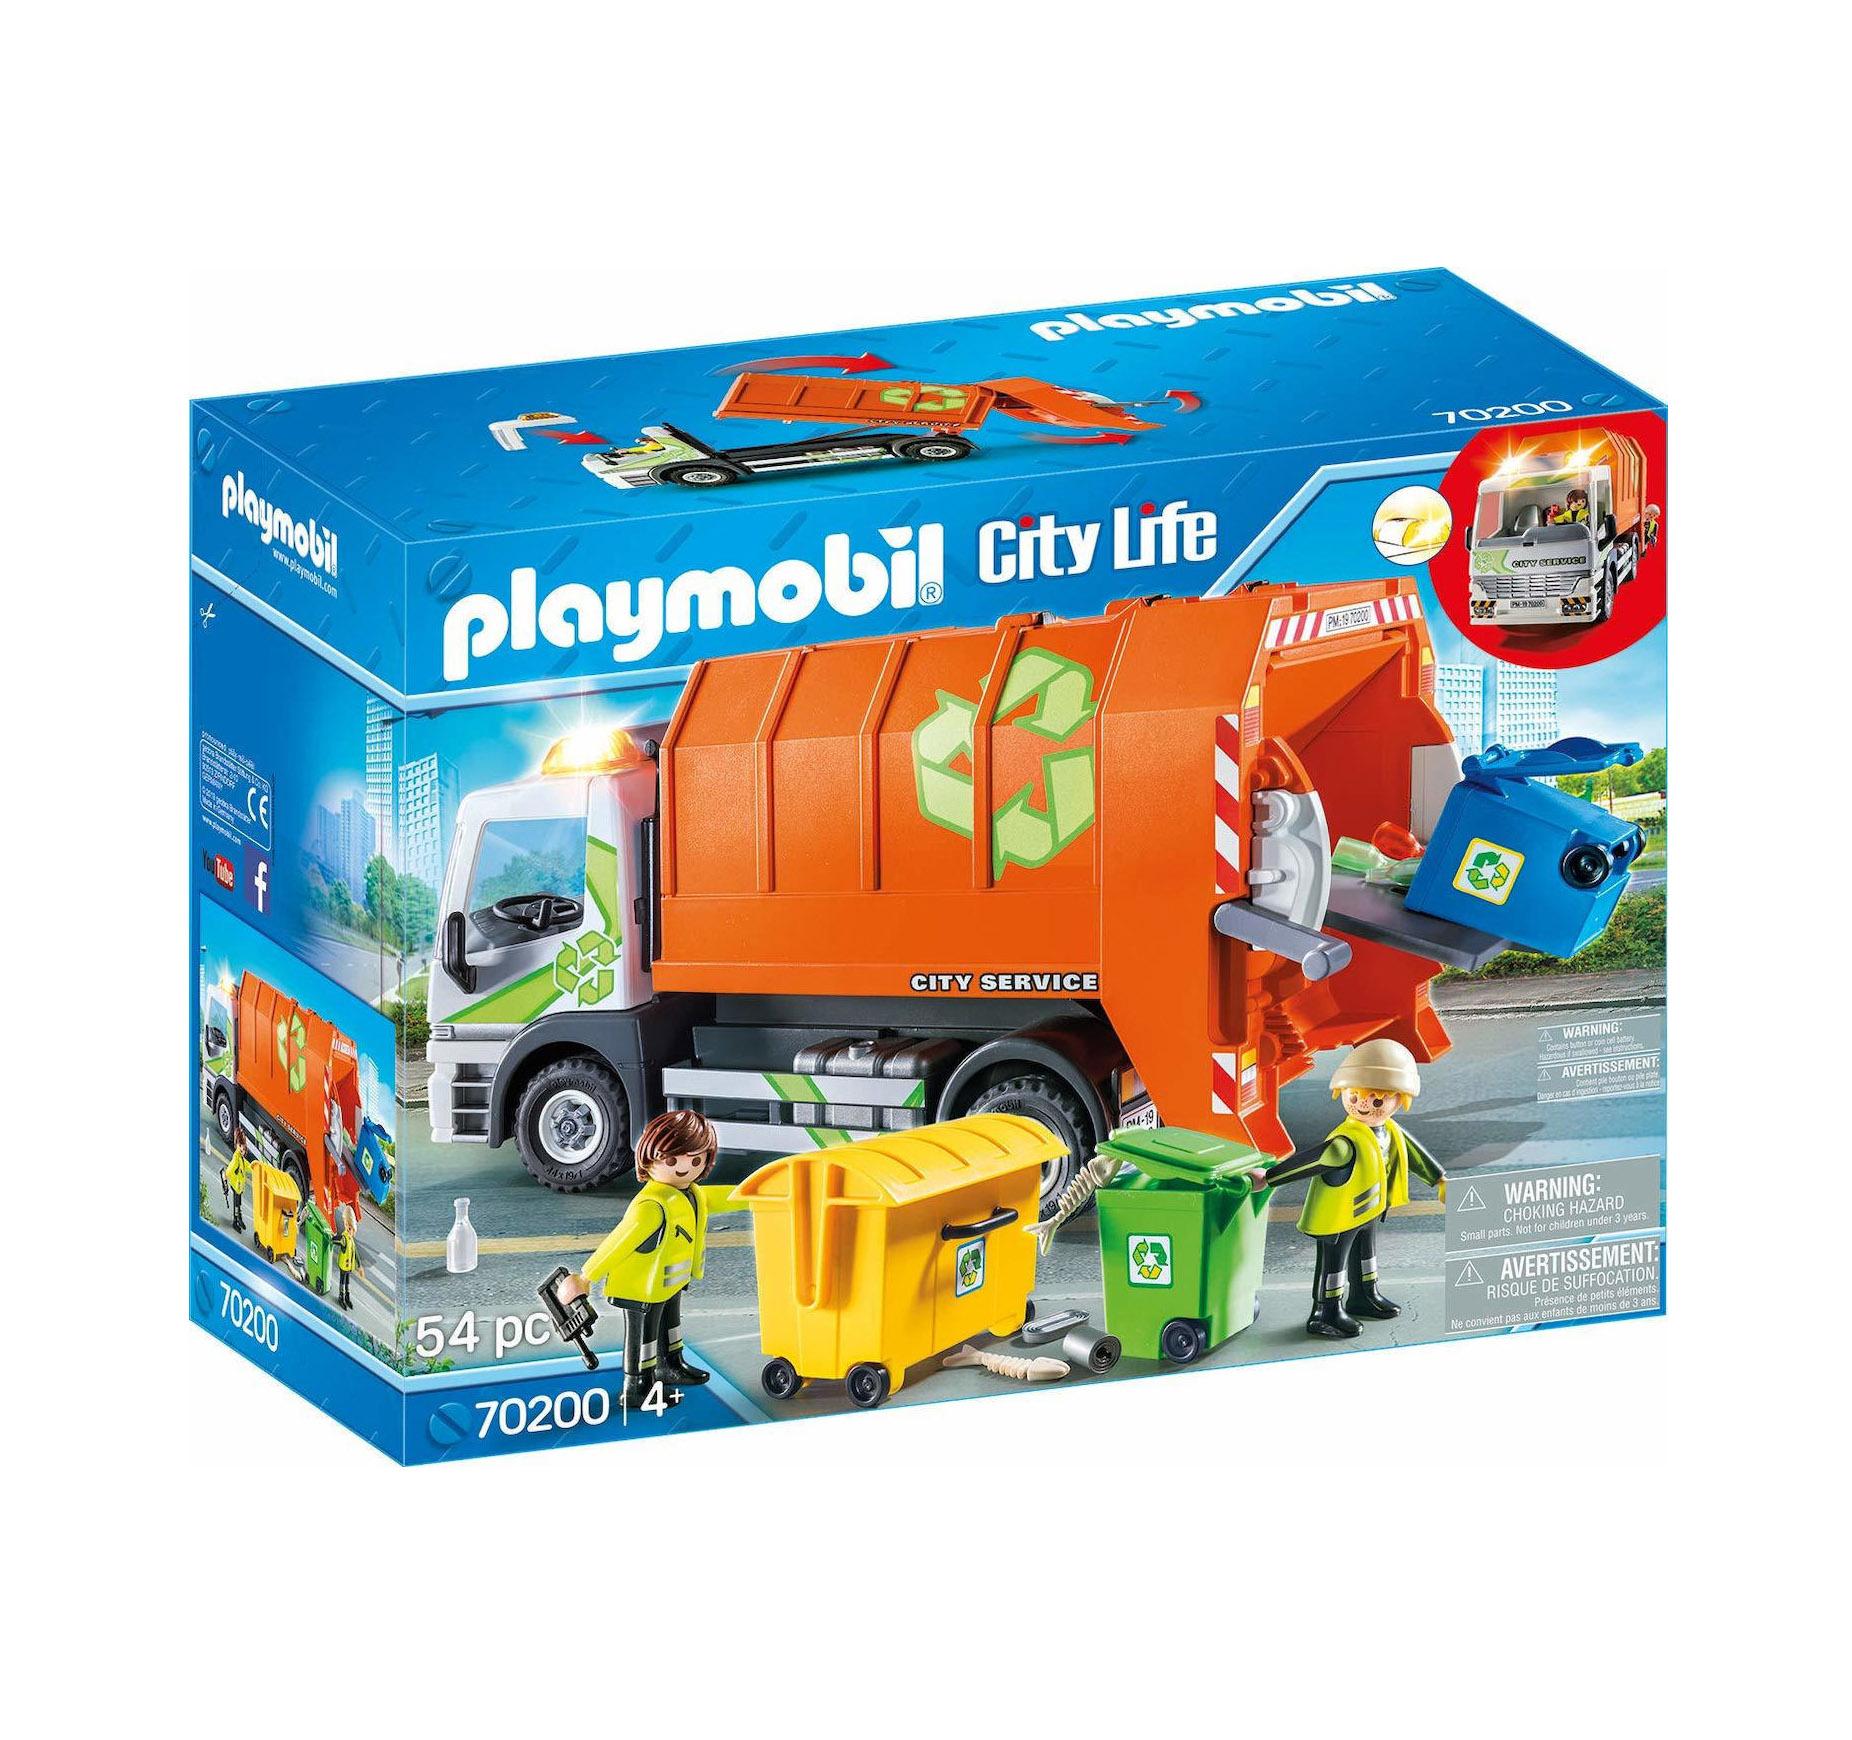 Playmobil City Life: Recycling Truck 70200